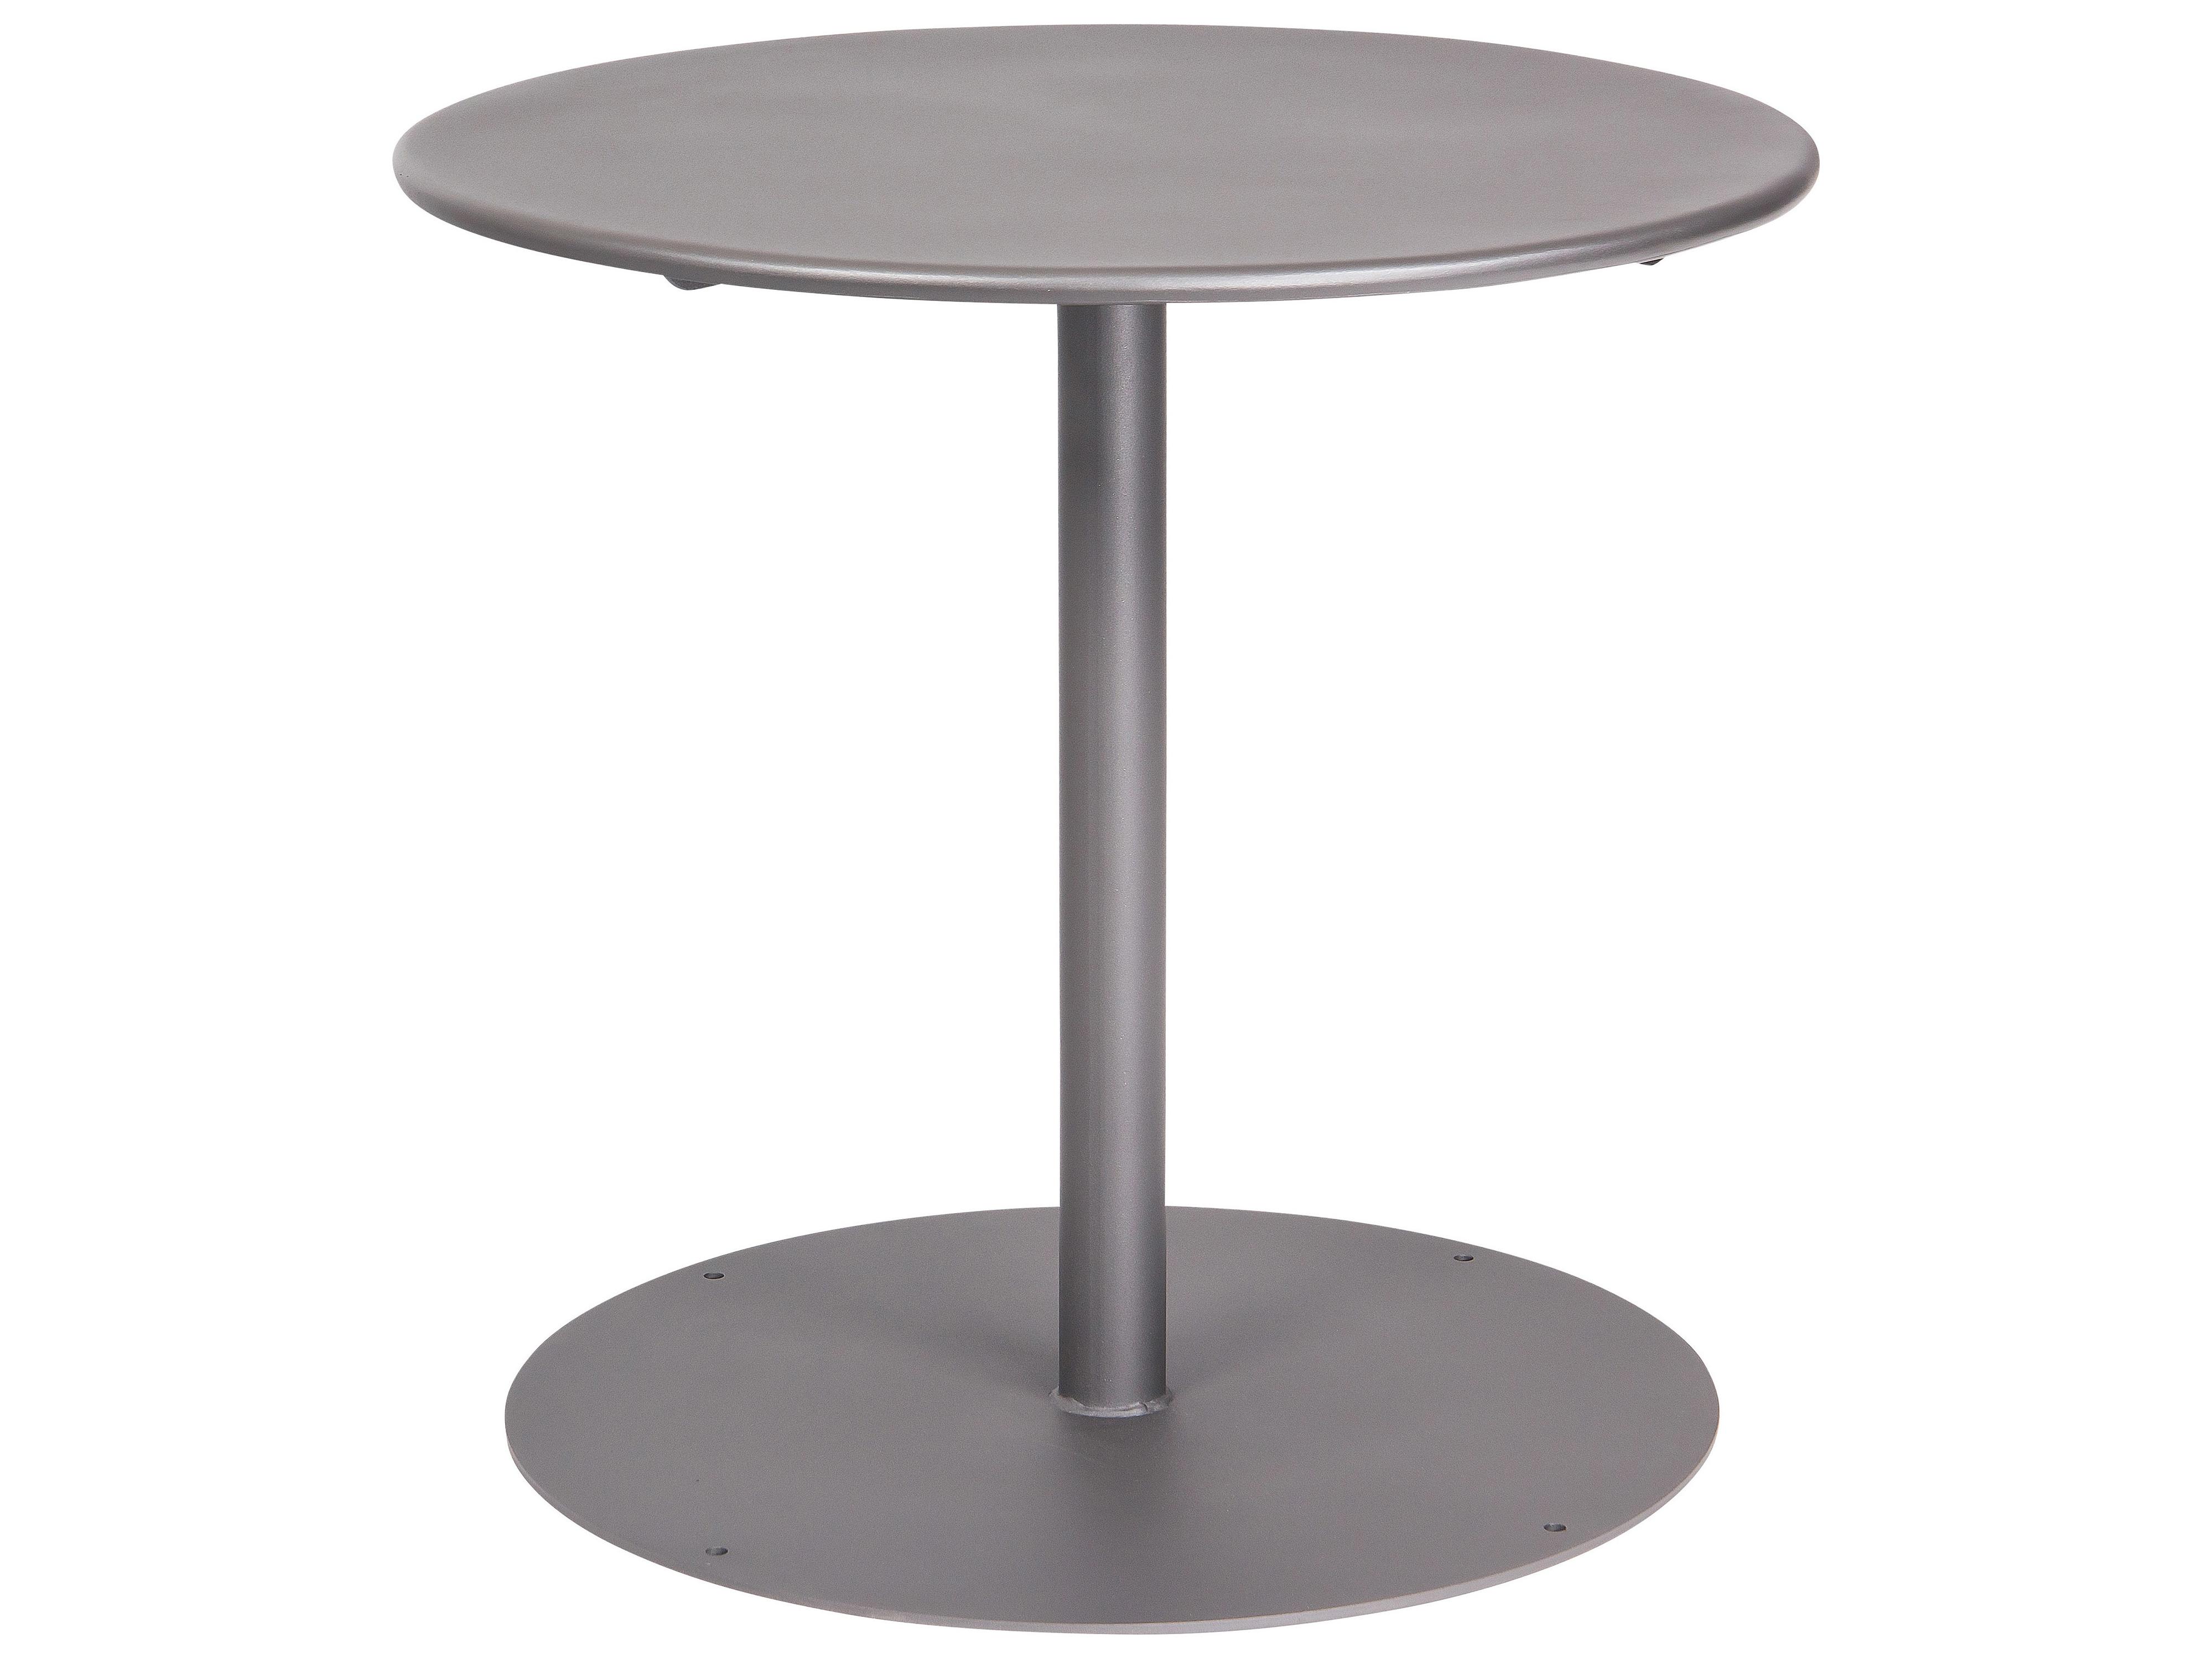 Woodard Wrought Iron 30 Round Bistro Table With Pedestal